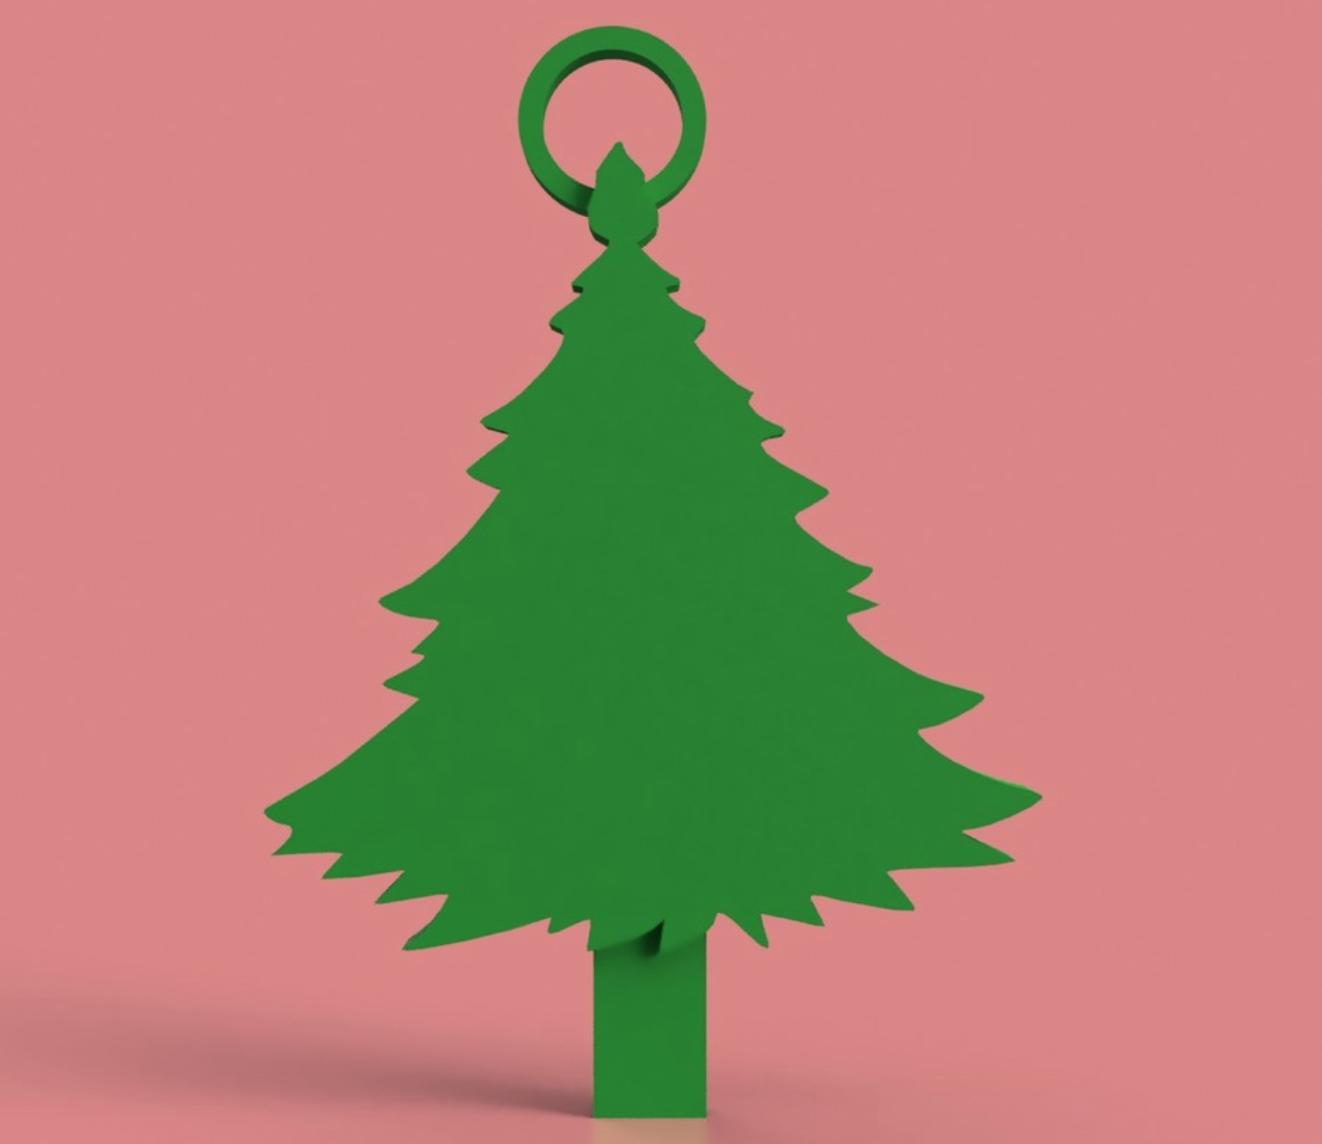 Capture d'écran 2017-12-06 à 16.58.11.png Download free STL file Christmas Tree Key Chain • 3D printable object, 3DPrintingGurus